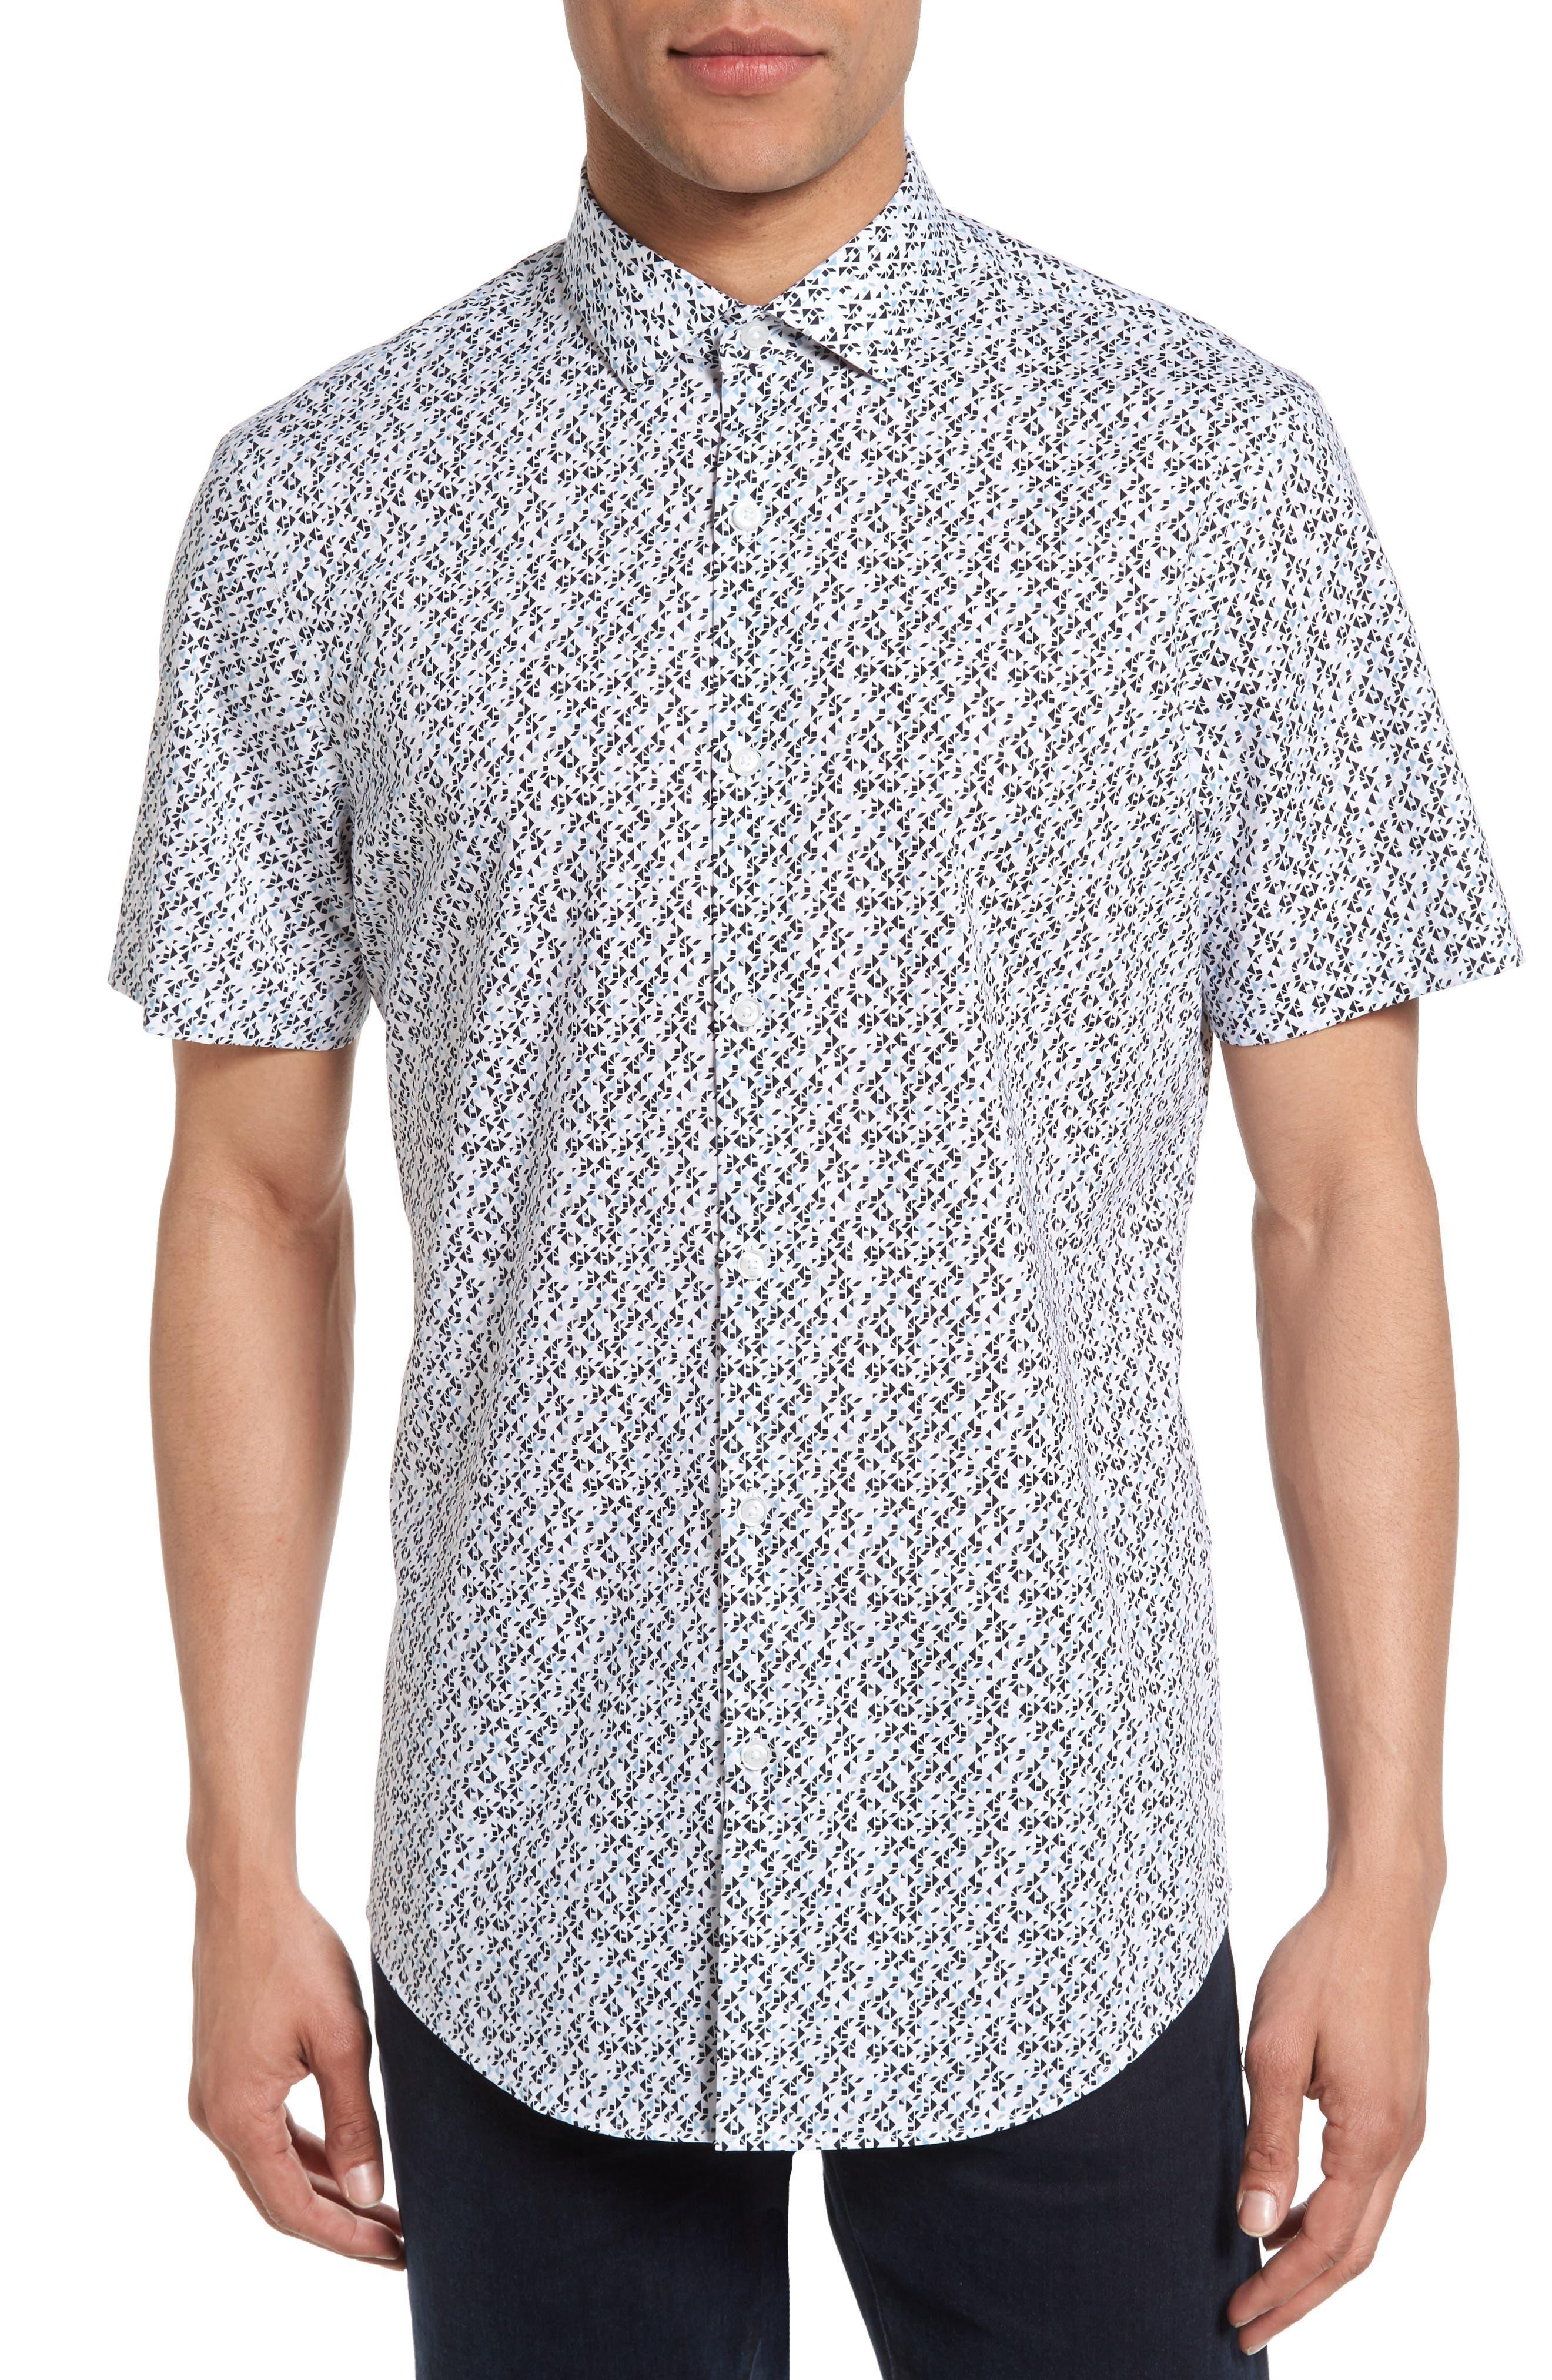 Main Image - Calibrate No-Iron Geo Print Woven Shirt